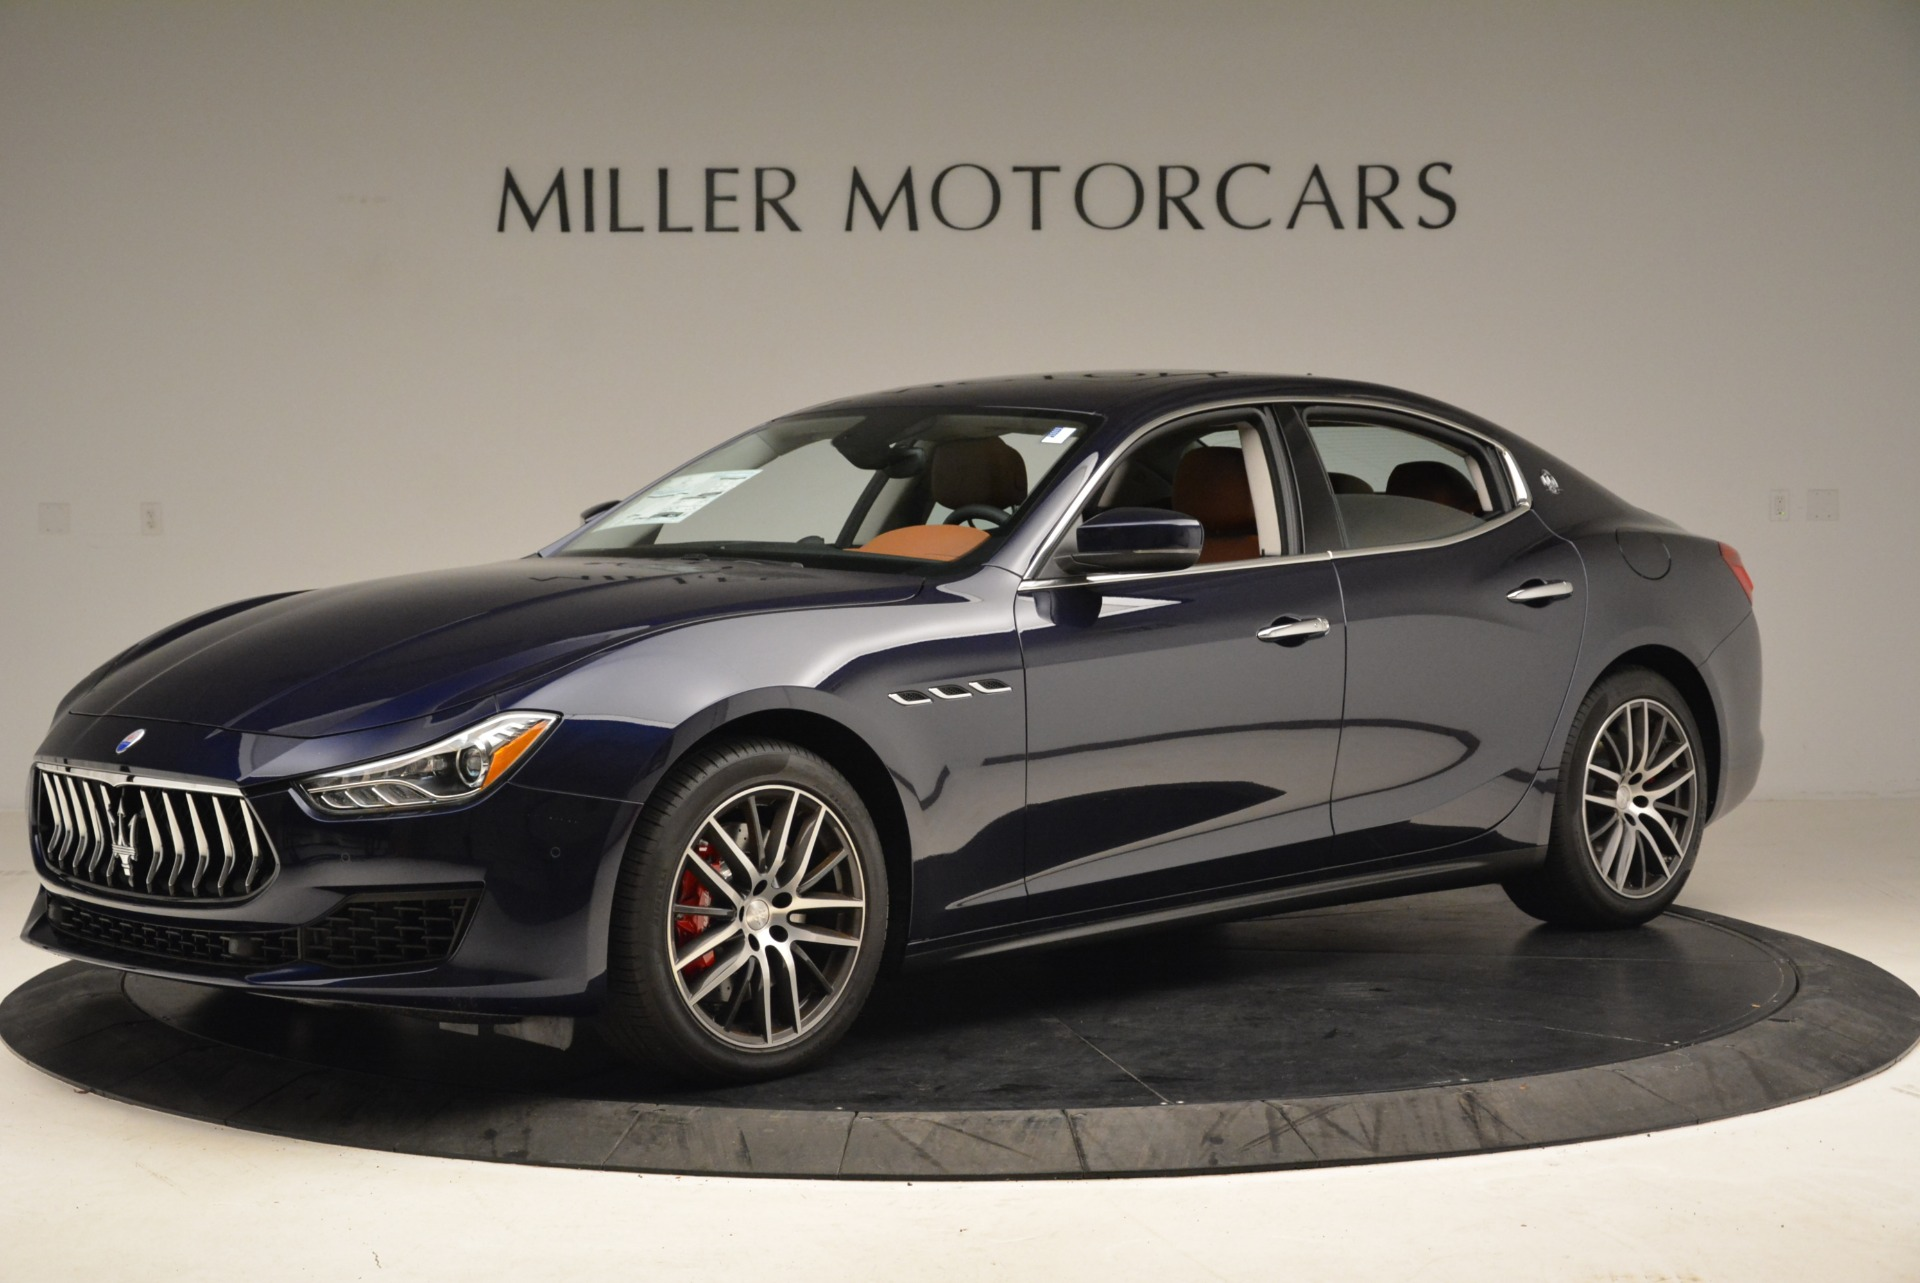 New 2019 Maserati Ghibli S Q4 For Sale In Westport, CT 3016_p2